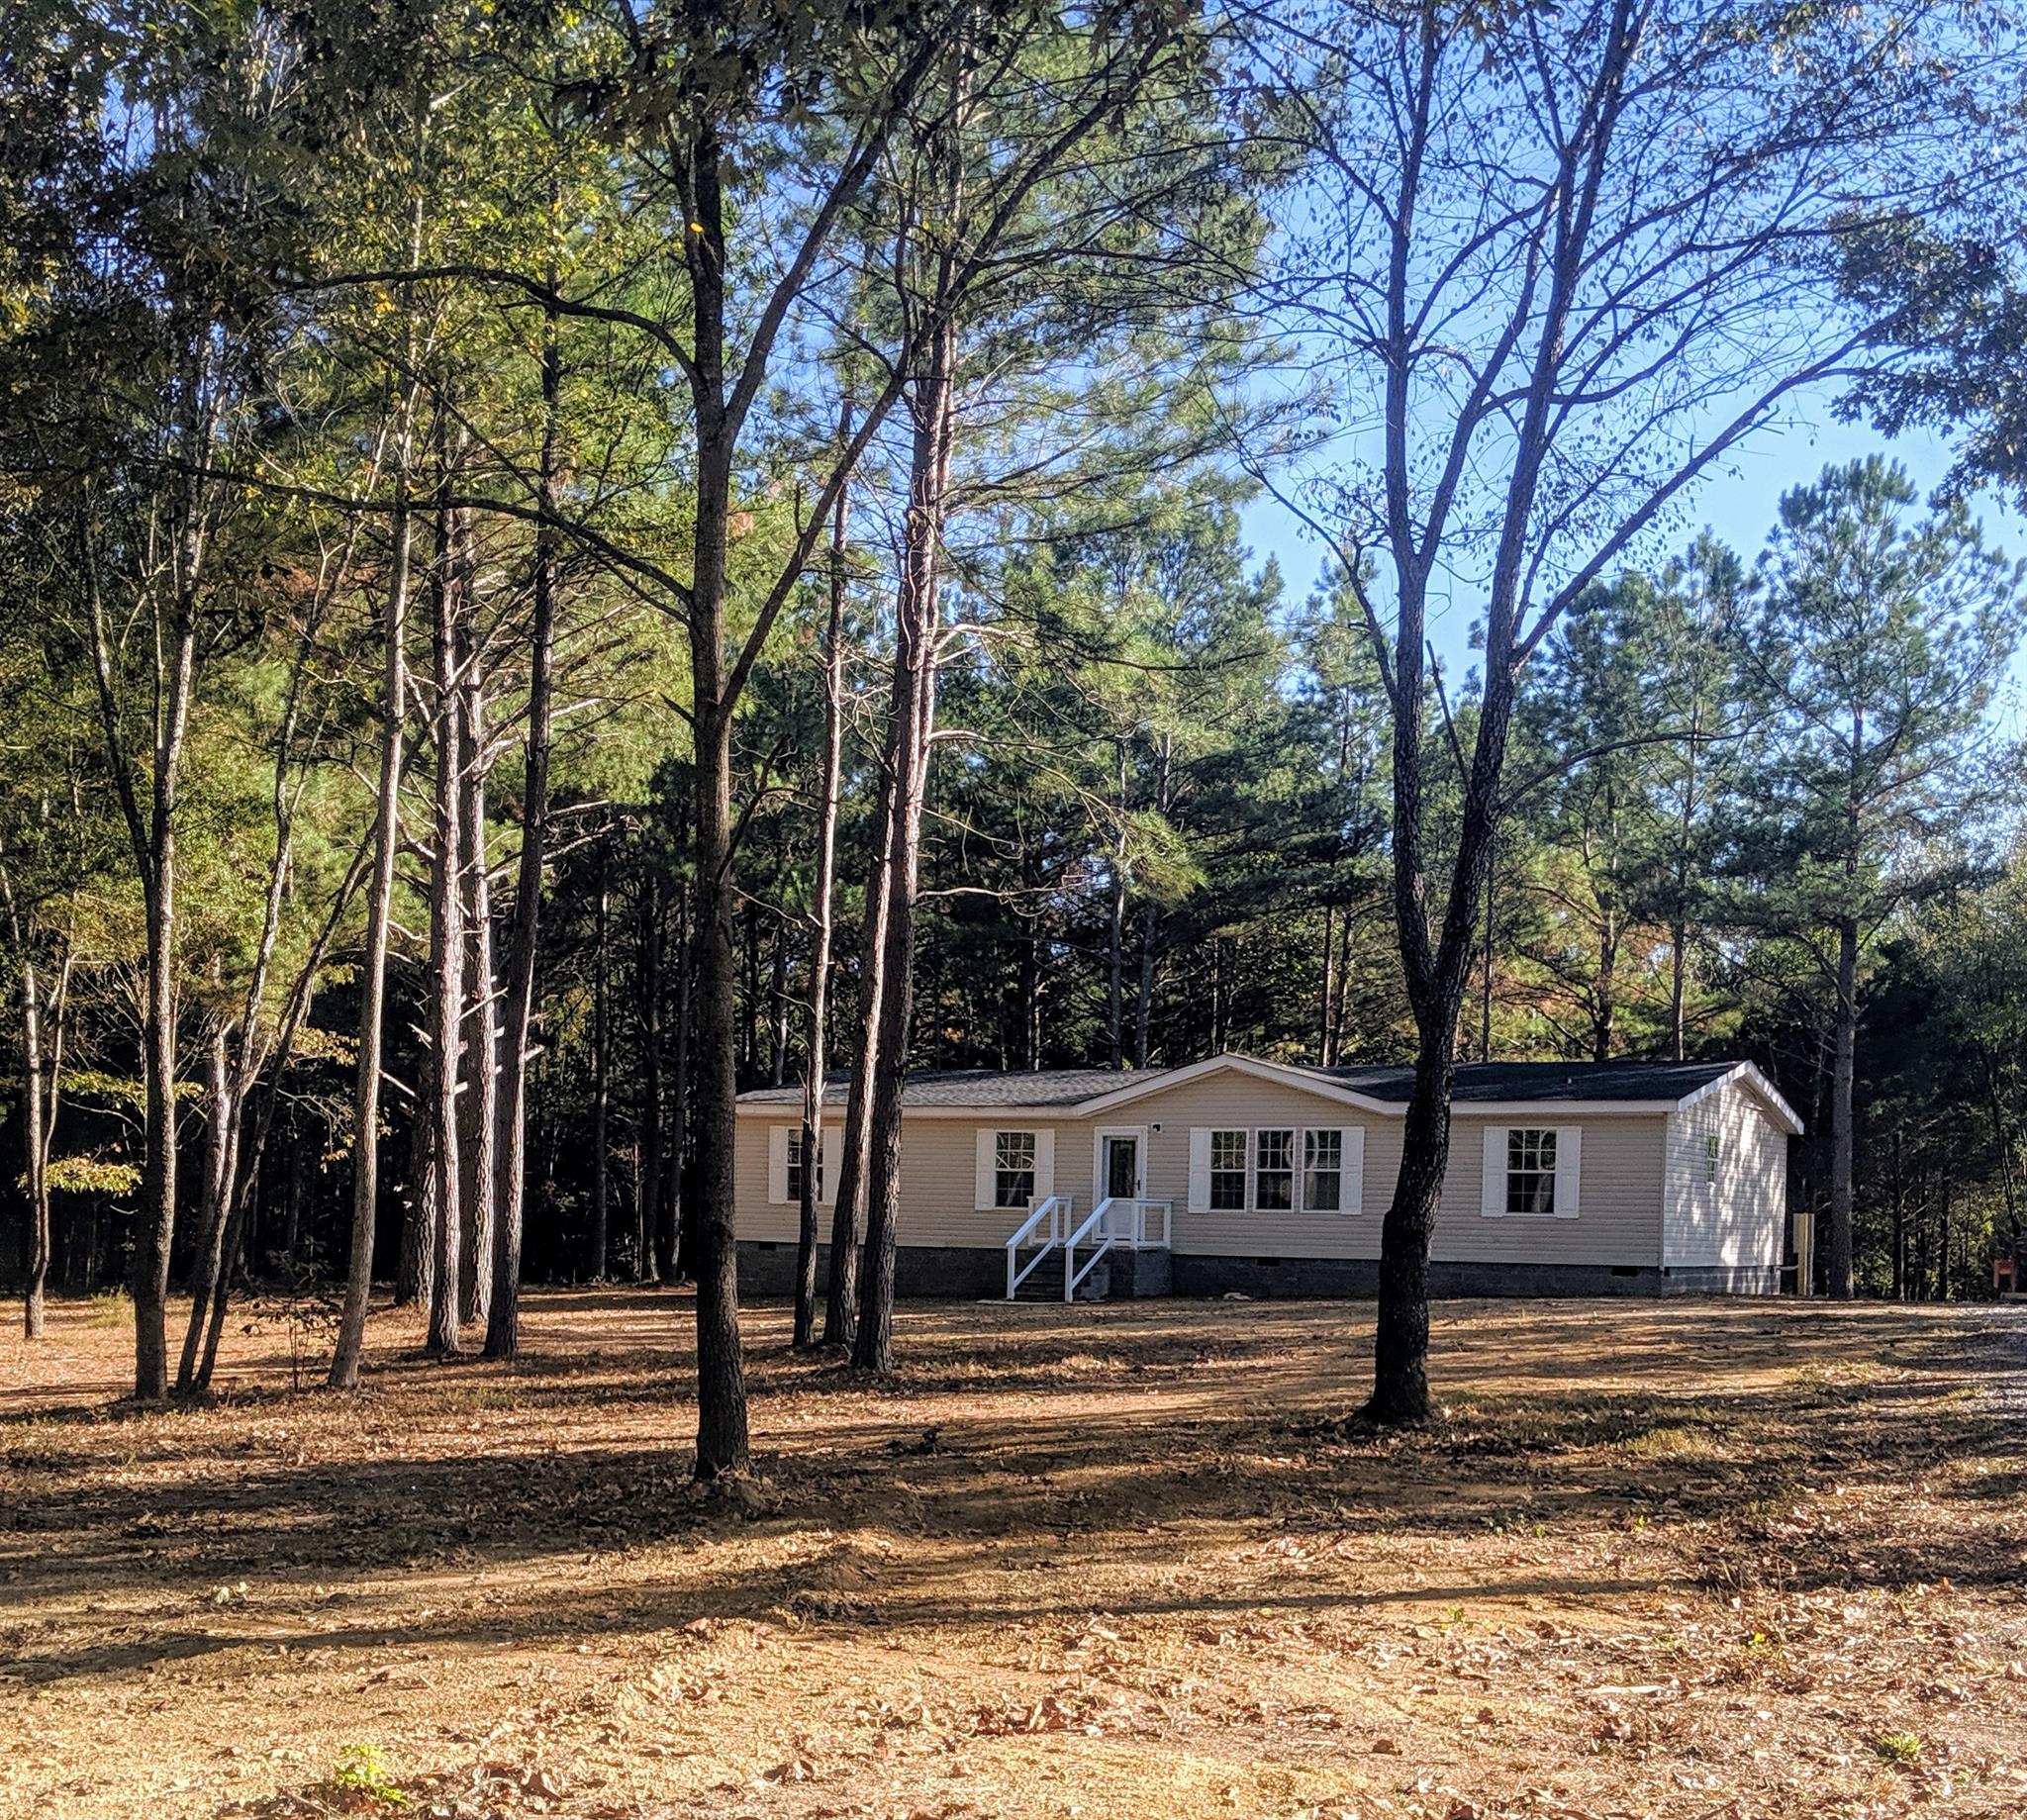 5699 Petigap Rd, Morrison, TN 37357 - Morrison, TN real estate listing